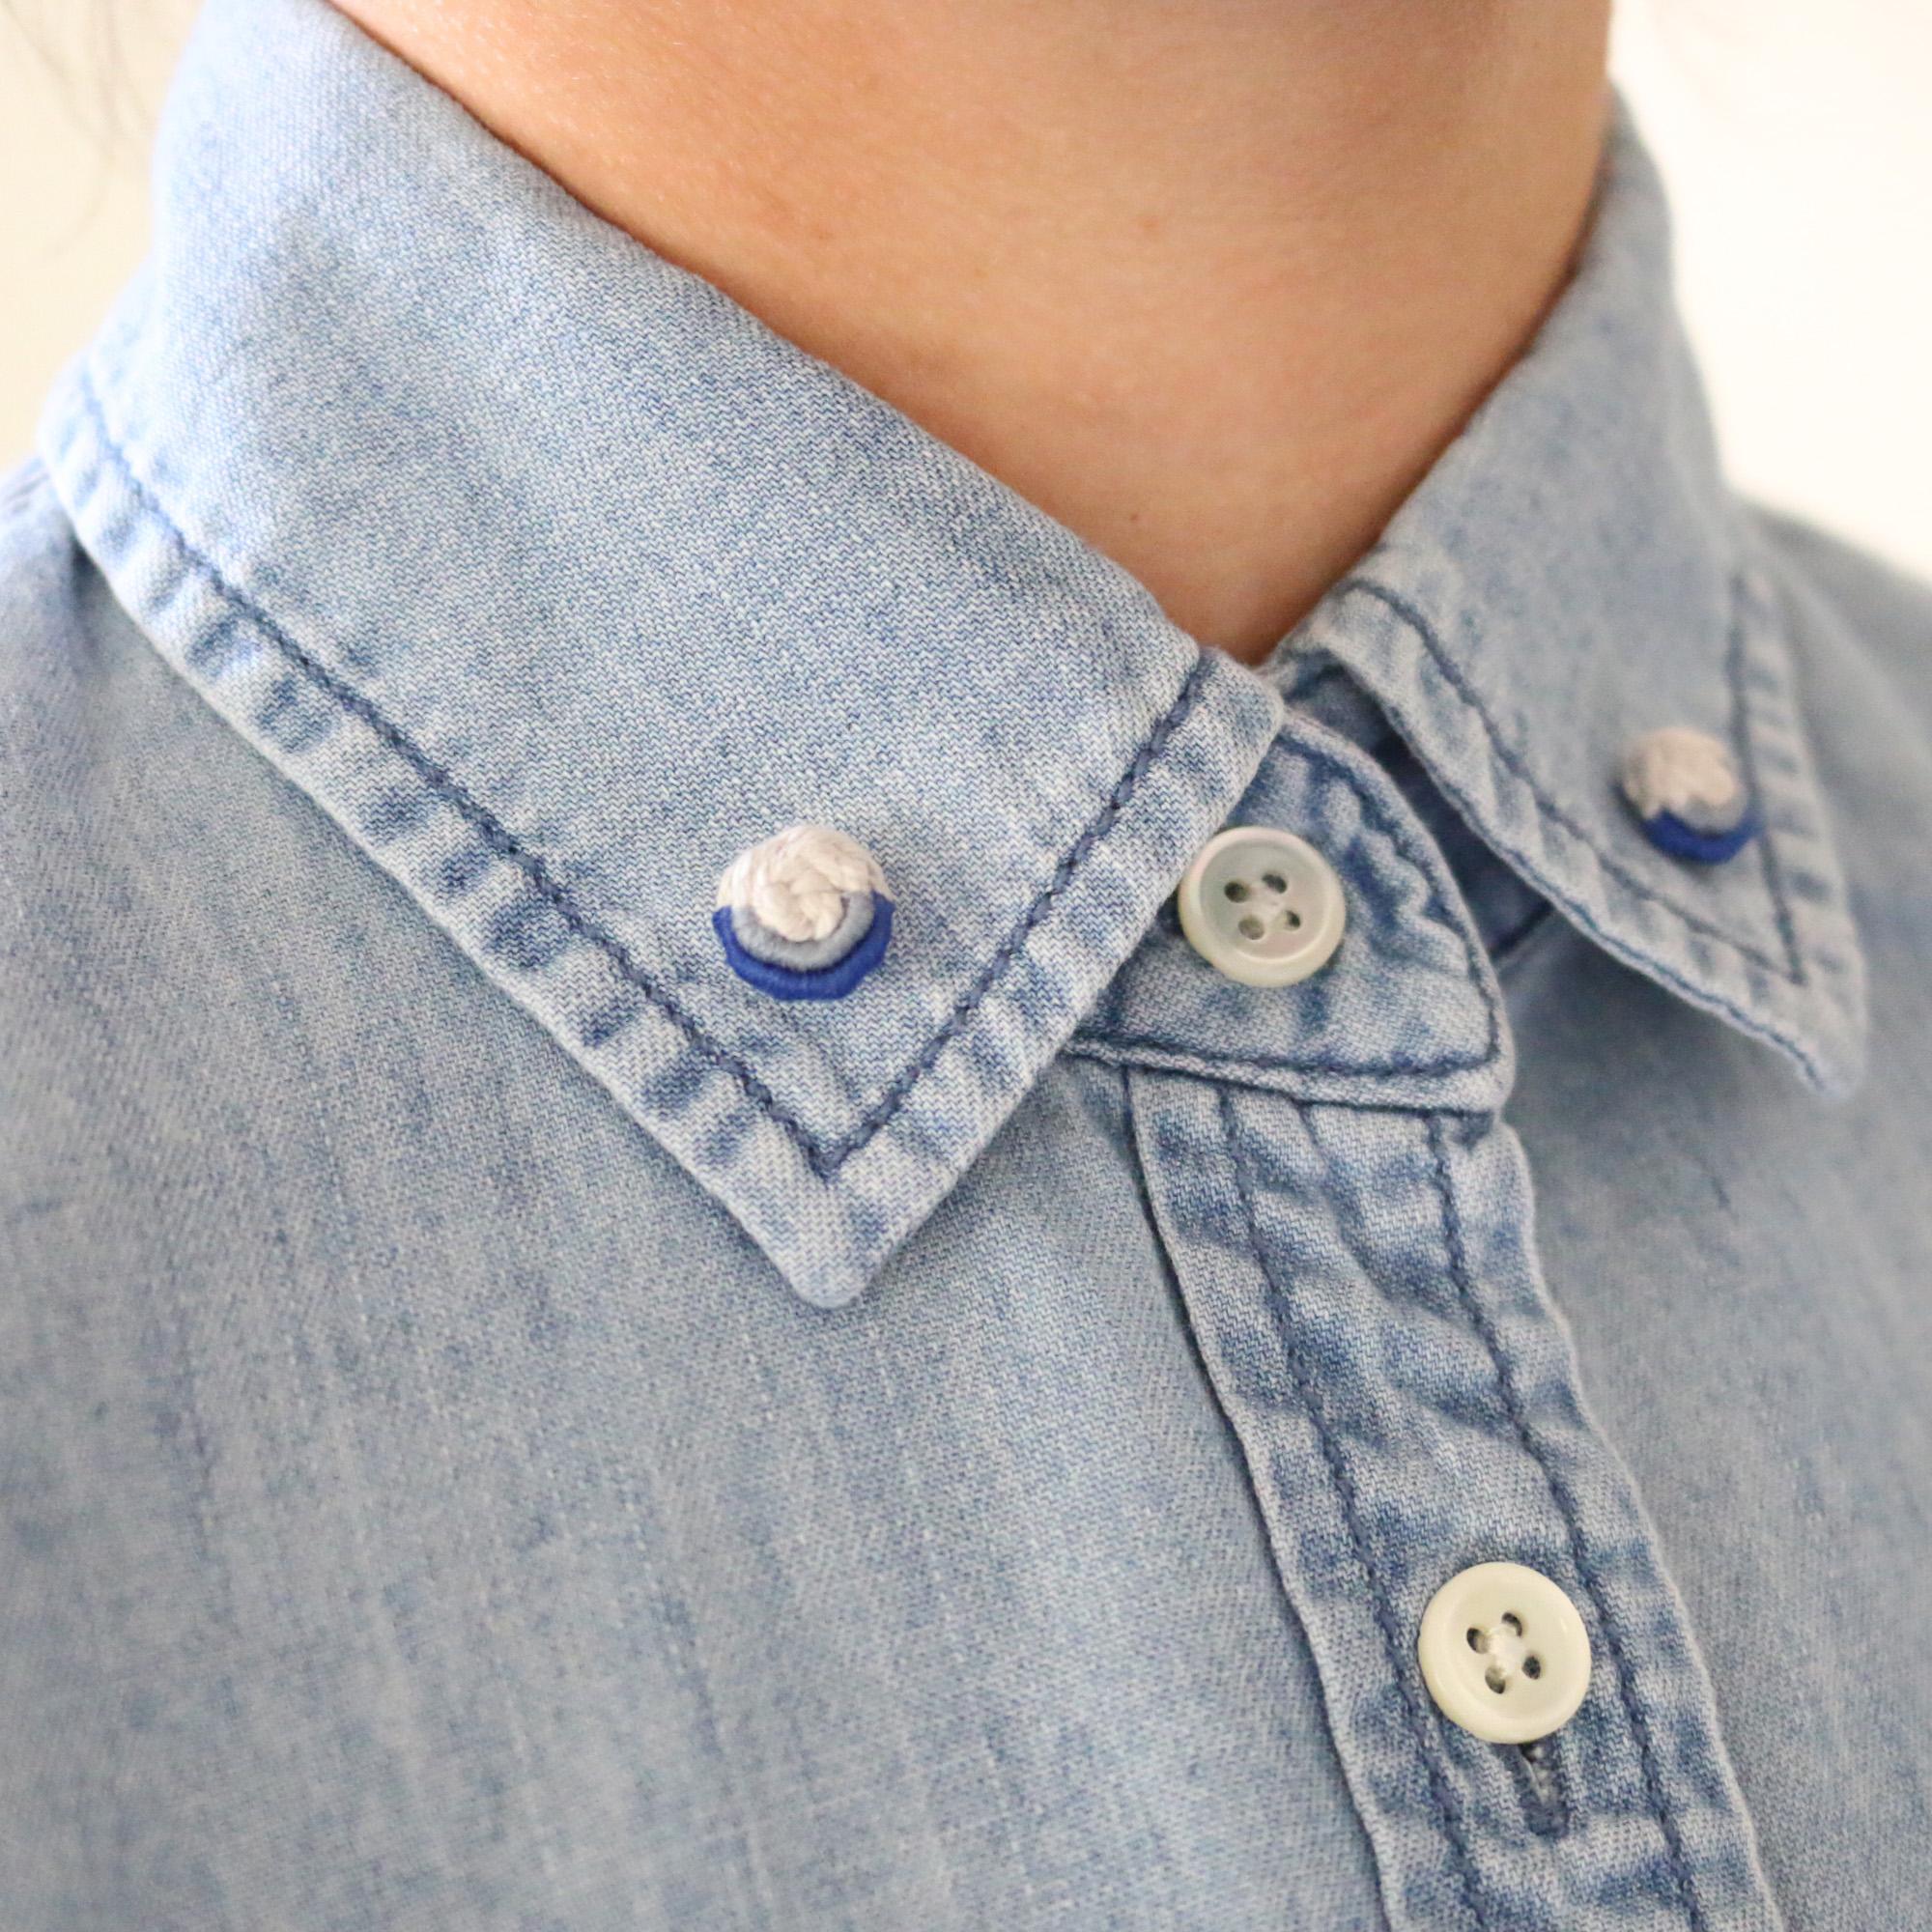 collar-tips-1.jpg